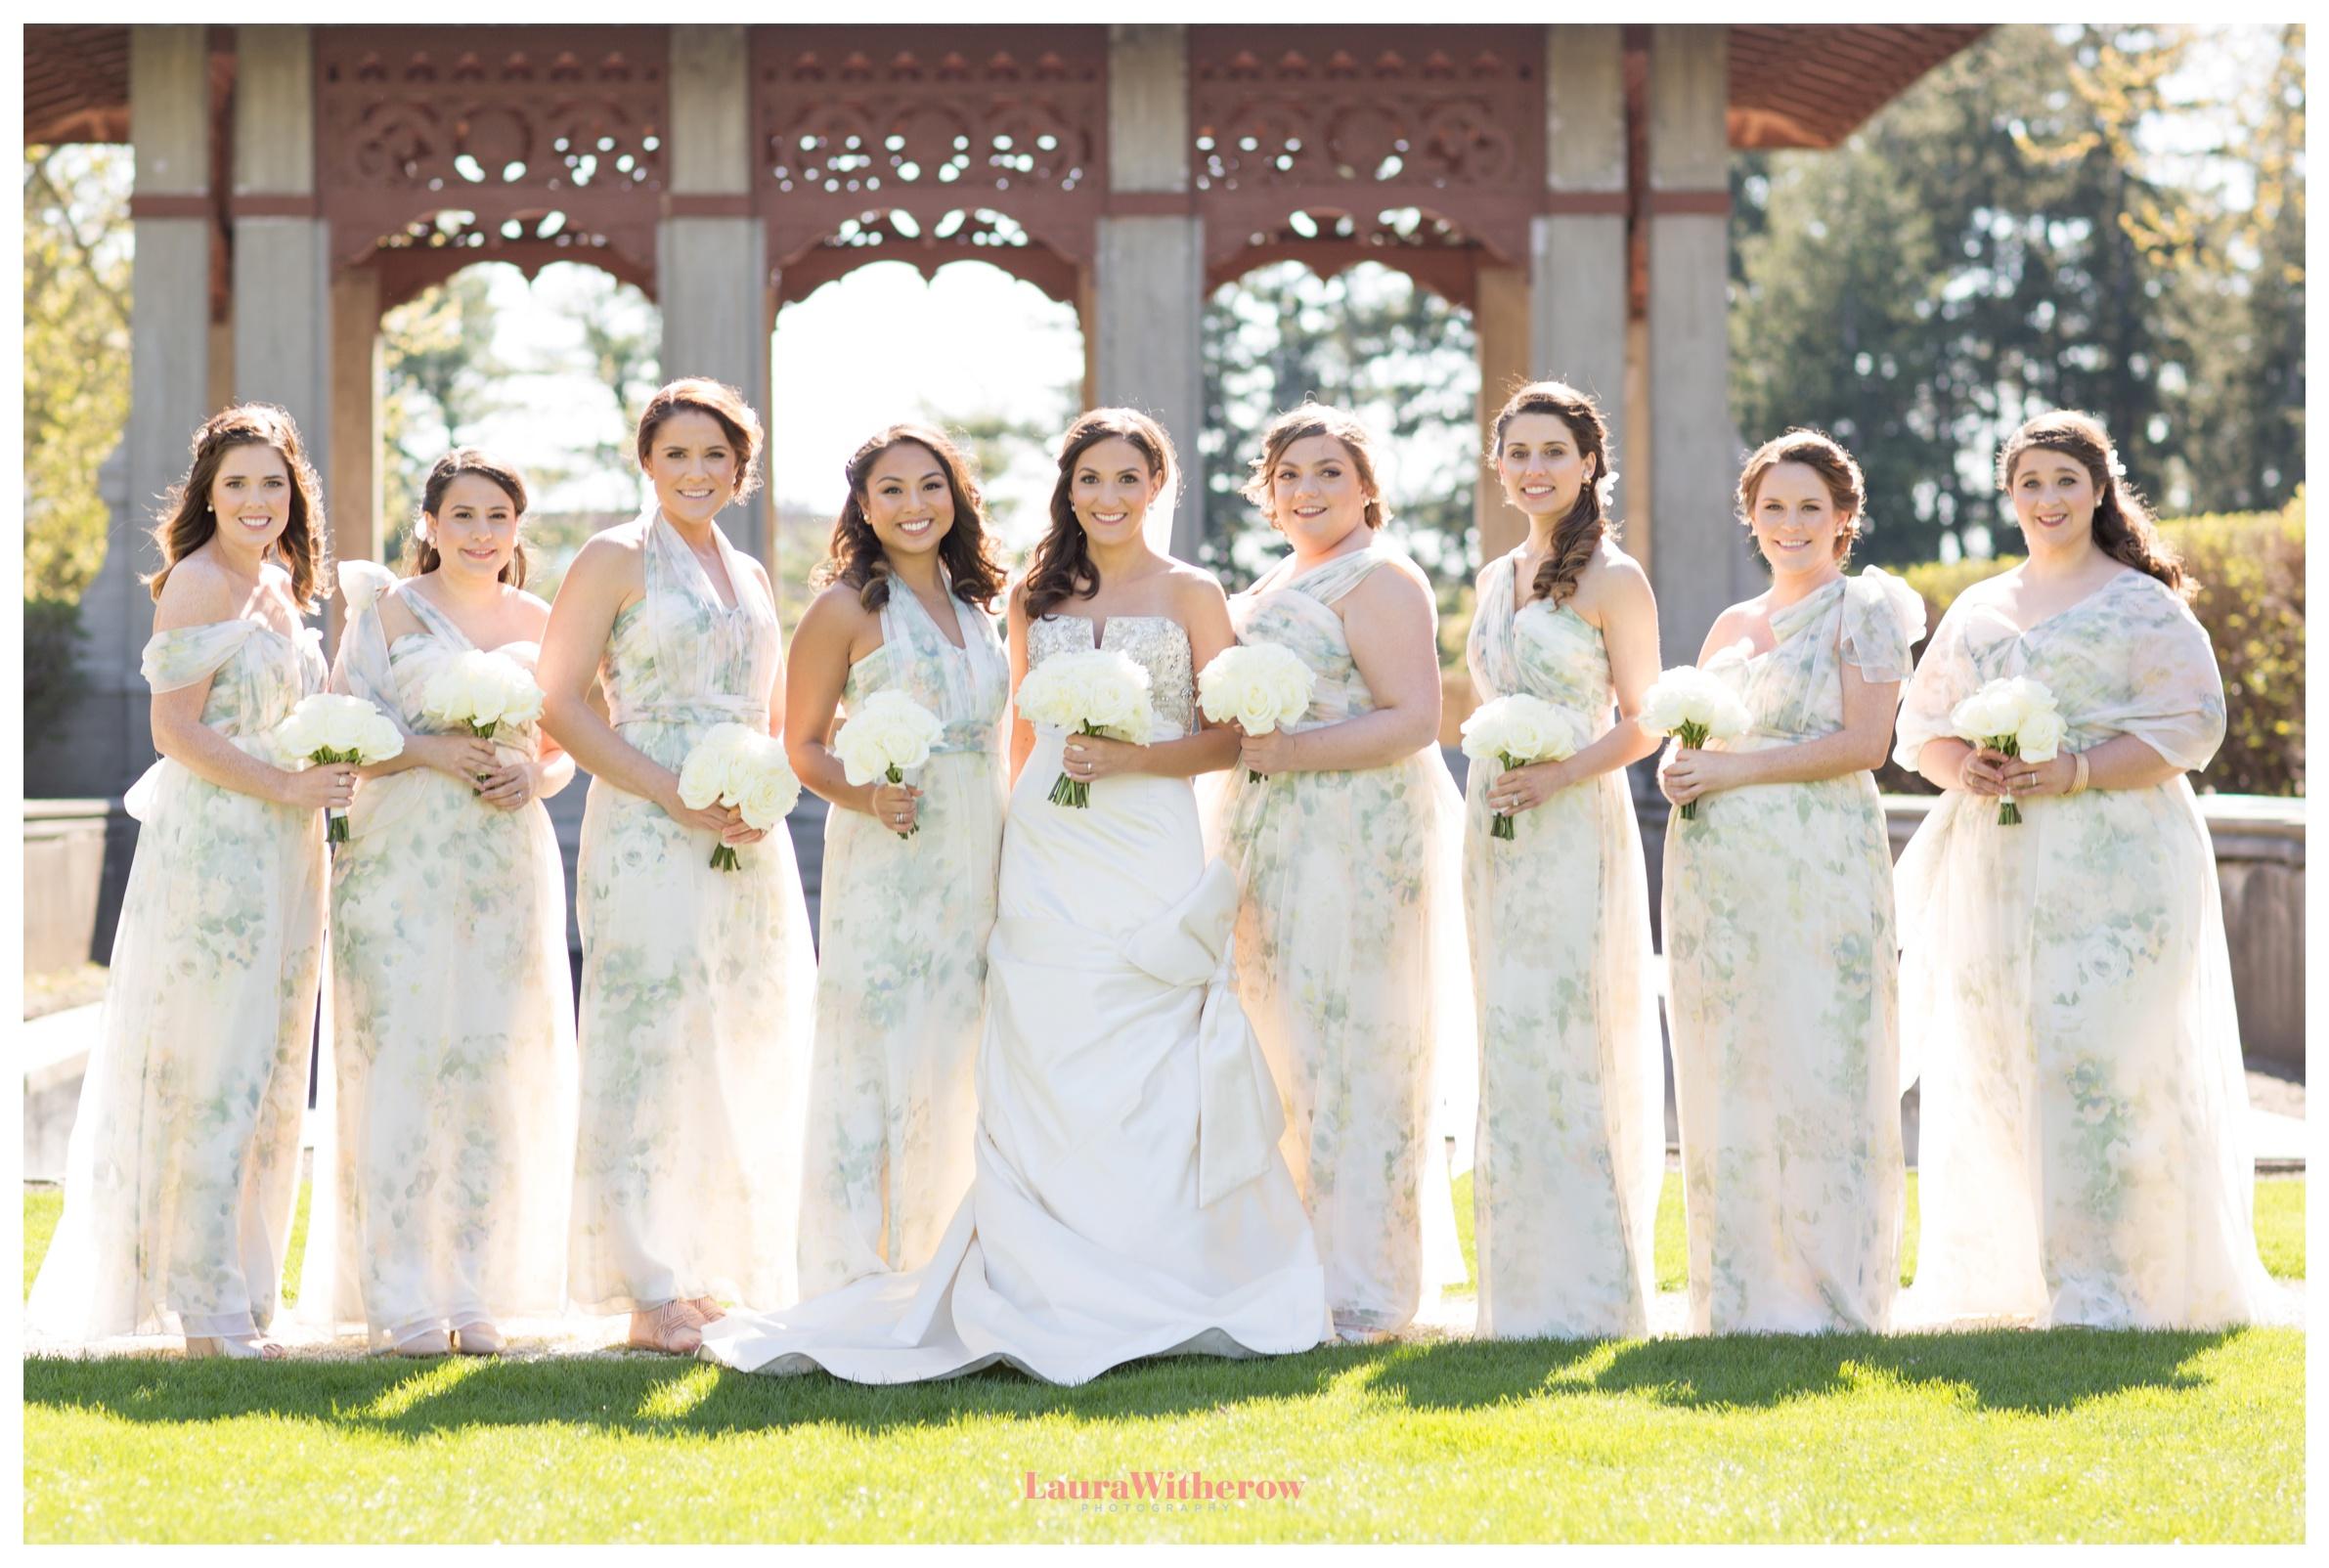 bridesmaids-jenny-yoo-floral-chicago